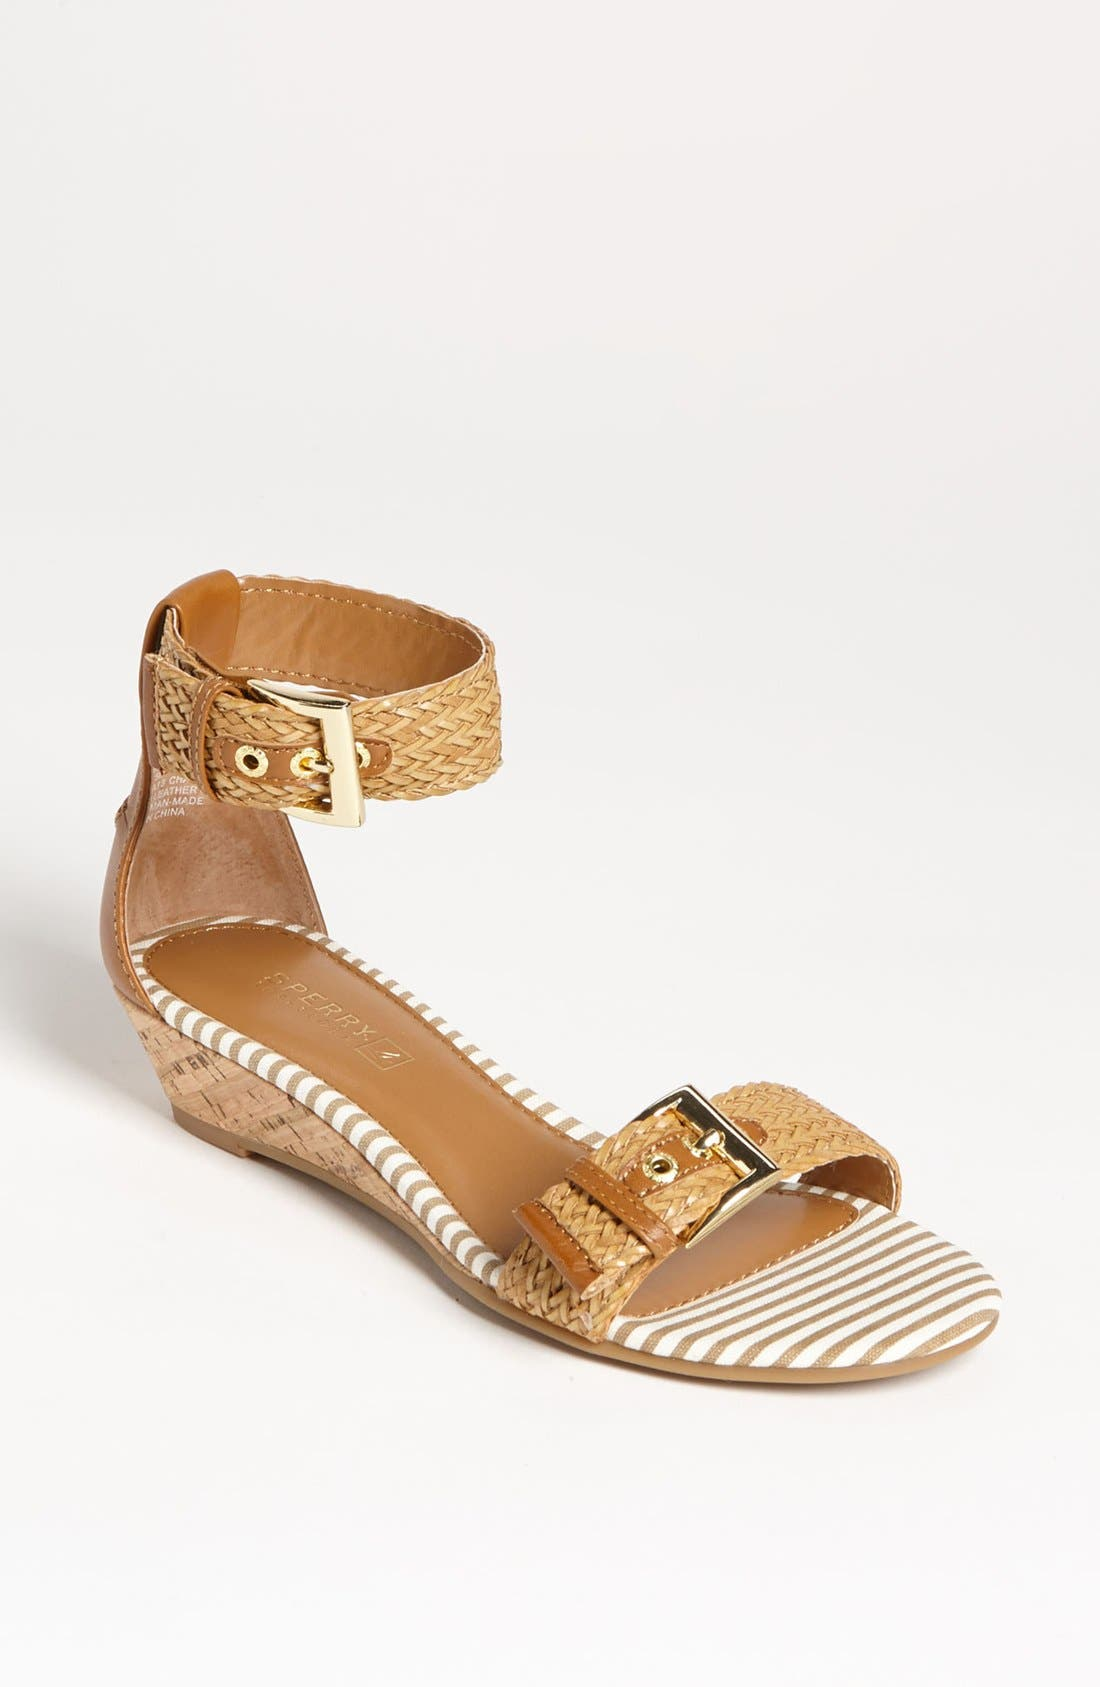 Alternate Image 1 Selected - Sperry Top-Sider® 'Lynbrook' Sandal